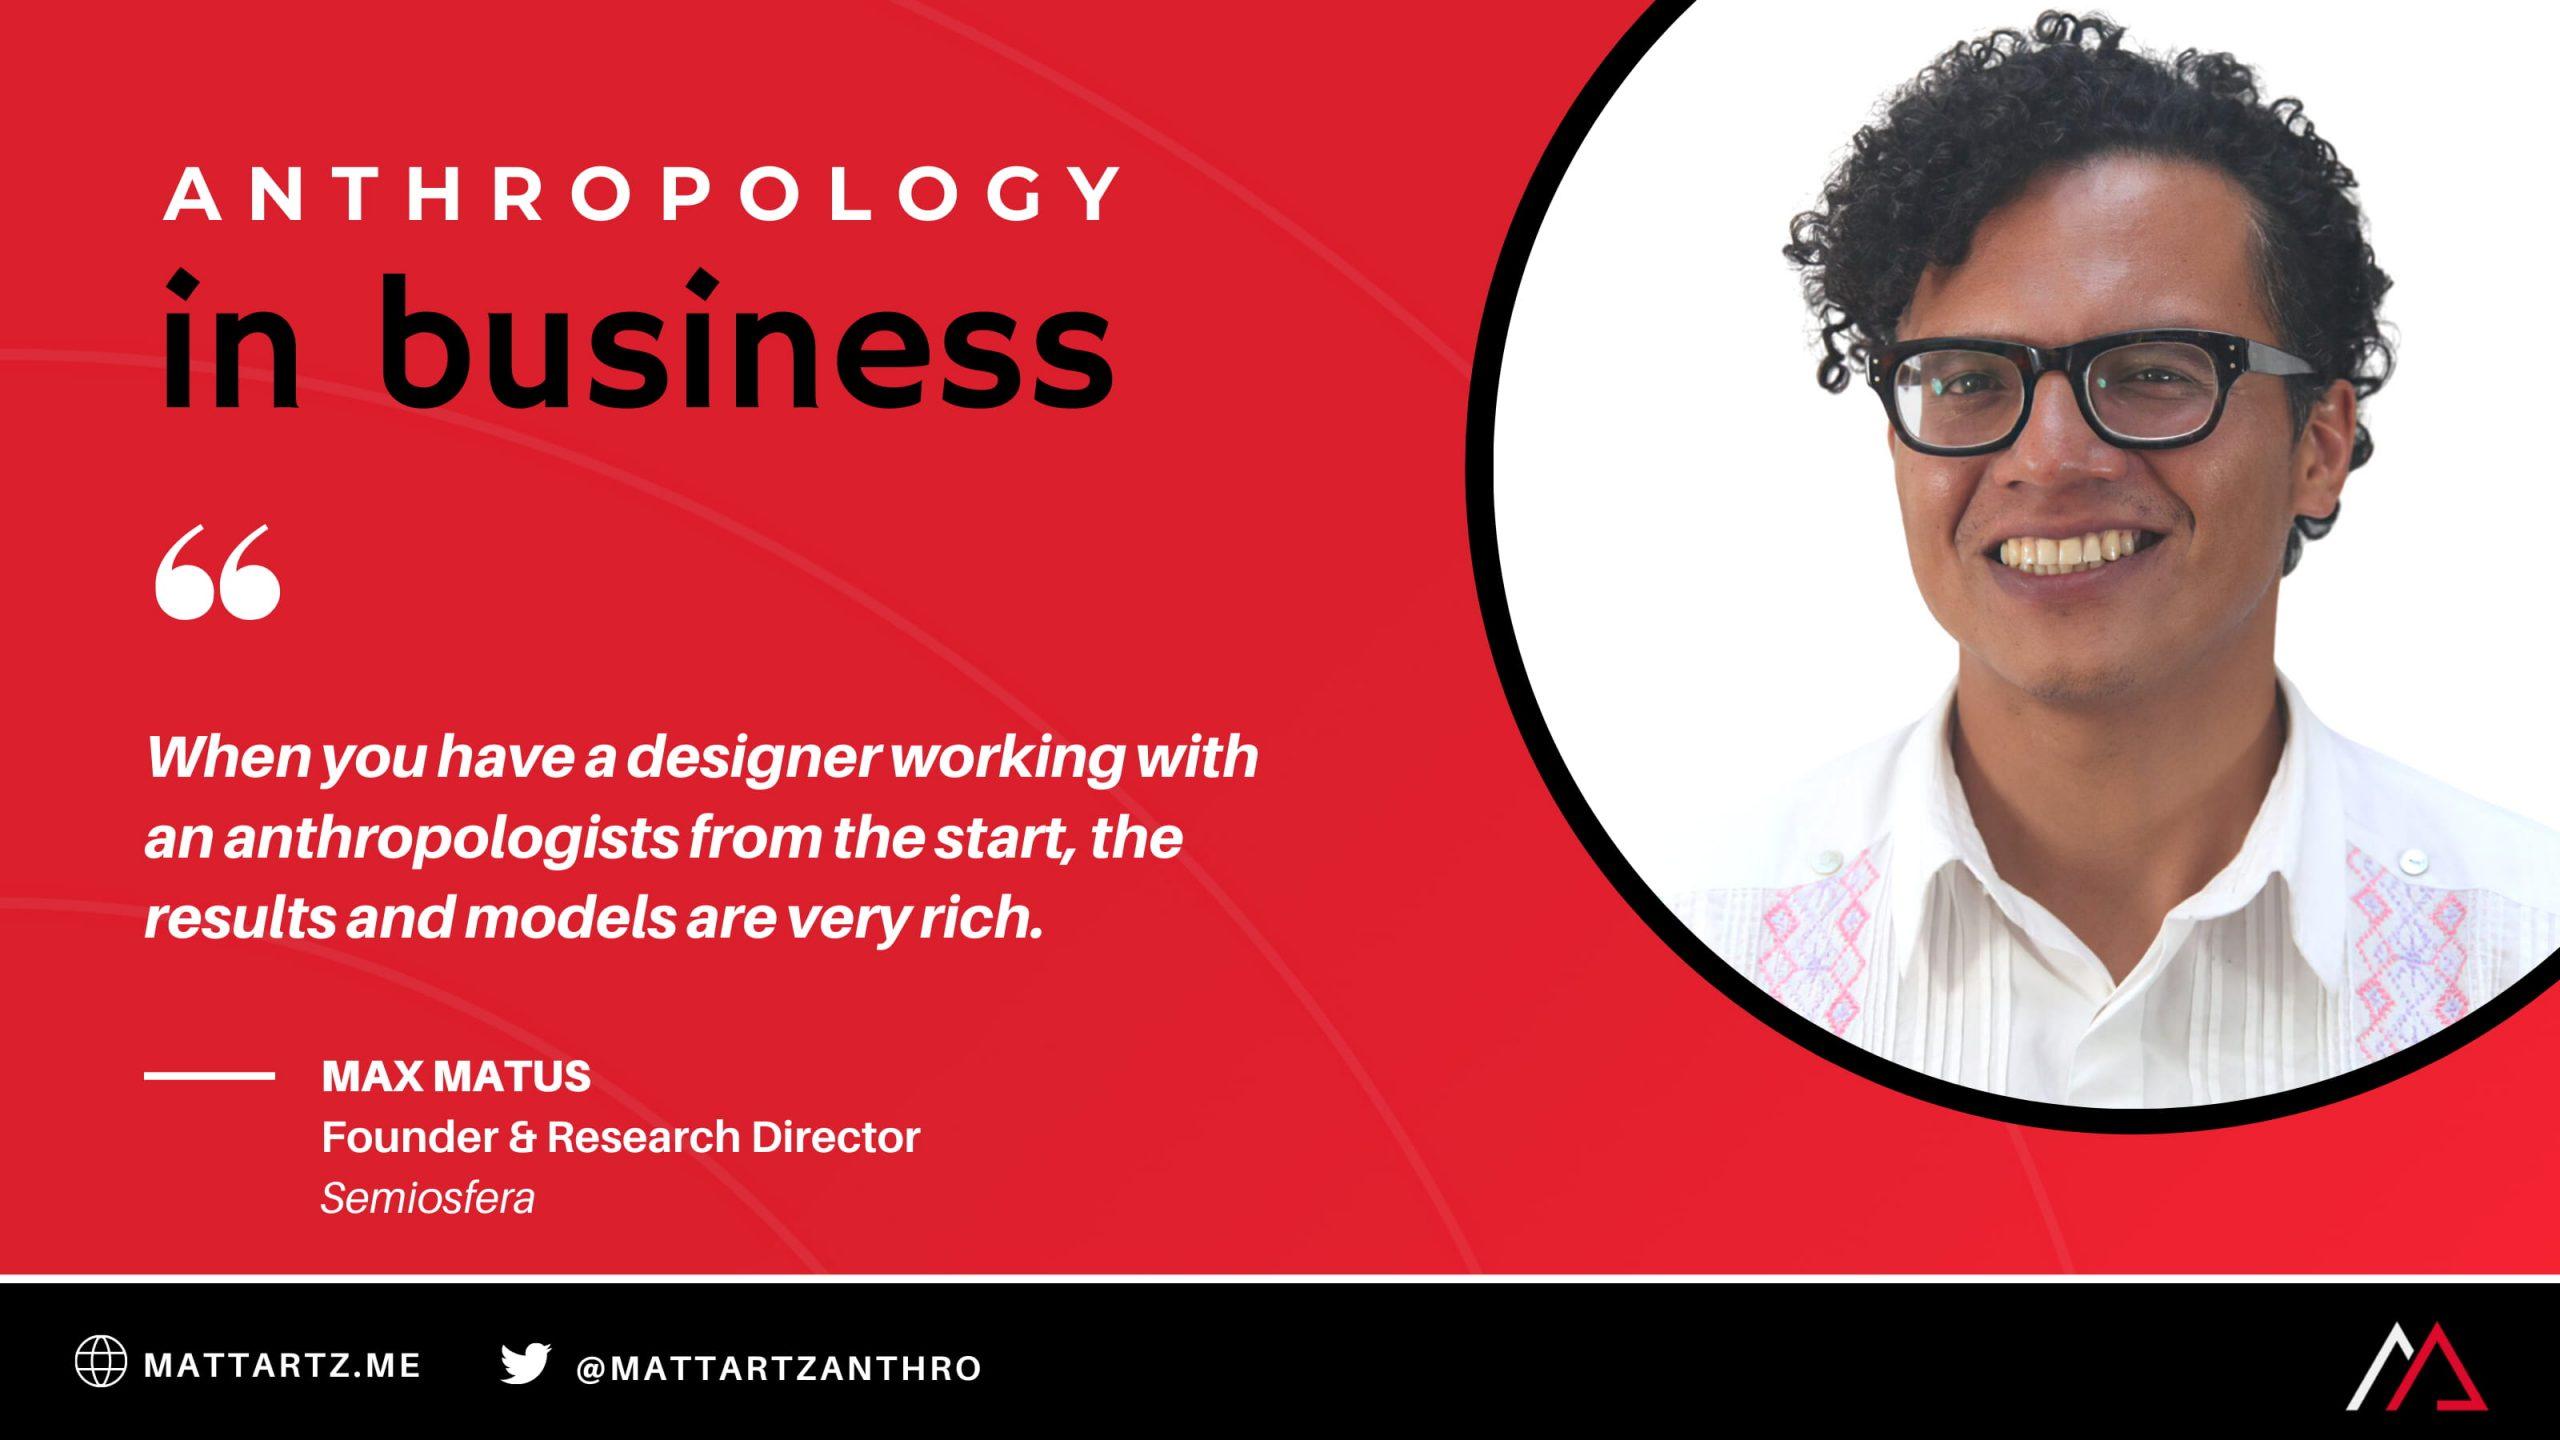 Max Matus on Anthropology in Business with Matt Artz